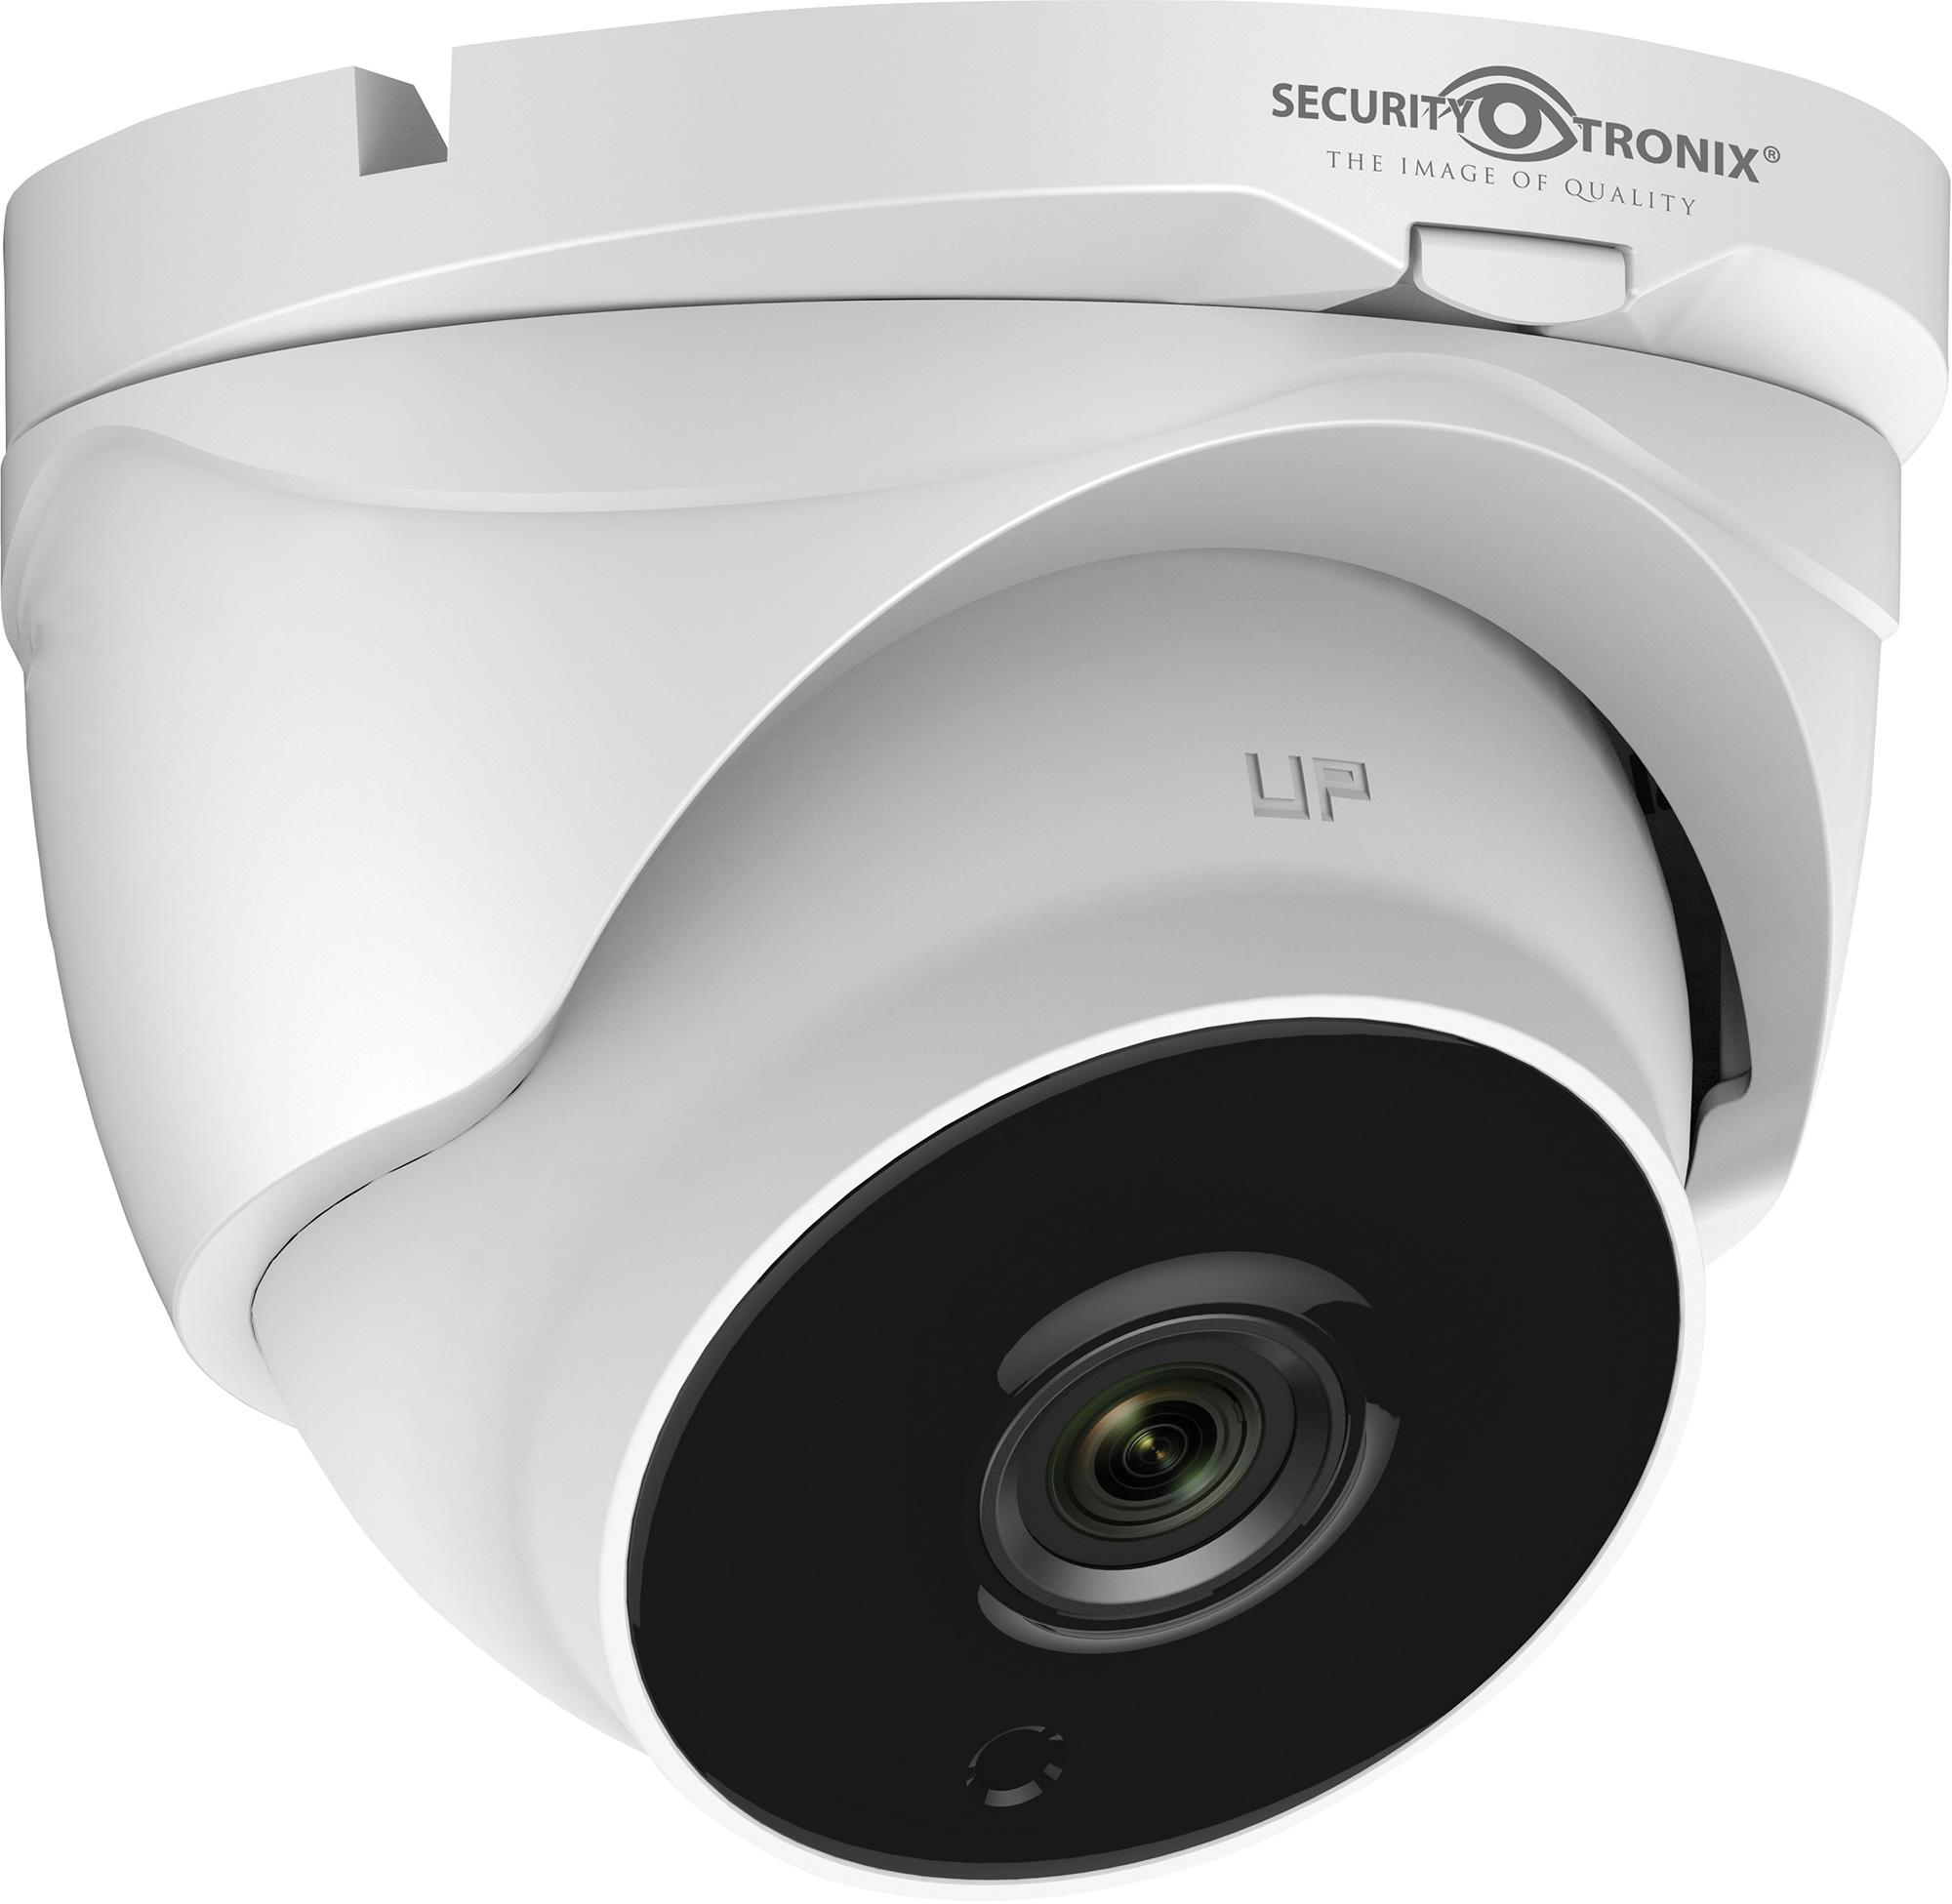 SecurityTronix ST-HDC2VFTD-MZ 2MP HD-TVI Motorized Varifocal Lens Turret Dome Camera SCT-STHDC2VFTDMZ